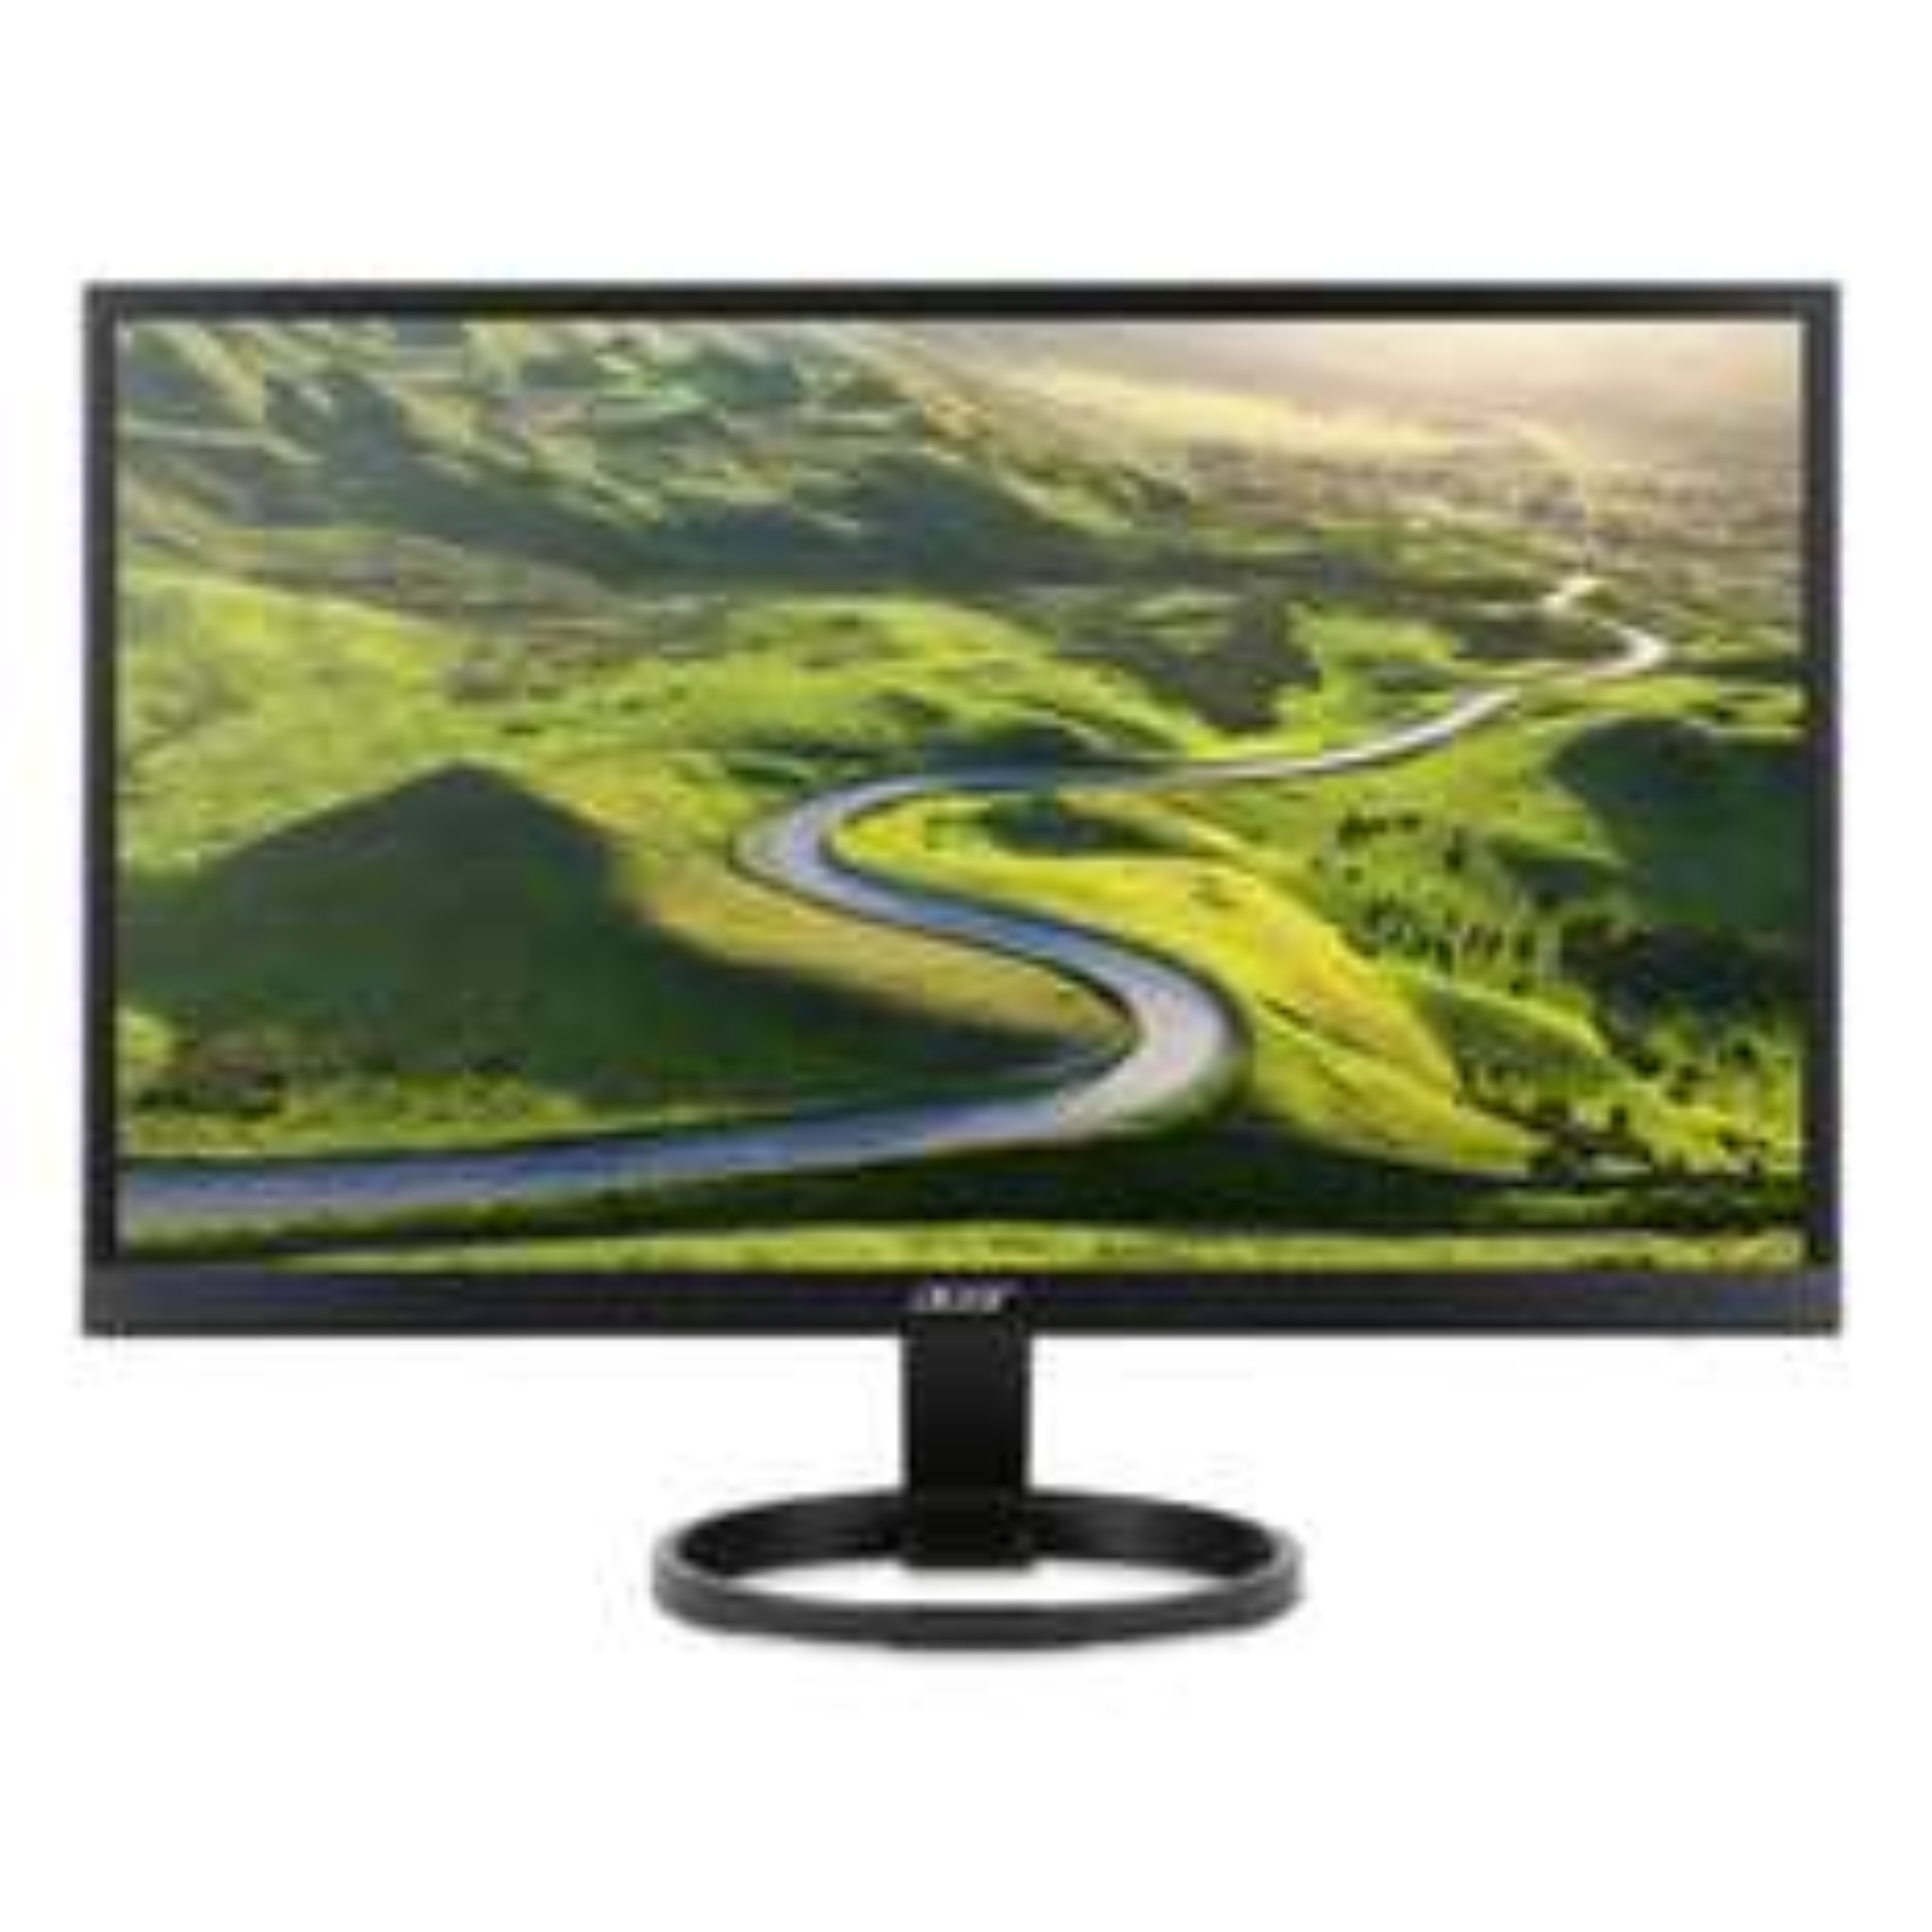 Acer R231bmid: 23 Zoll LED TFT, IPS-Panel, 4 ms, Lautsprecher, HDMI, DVI-D, VGA für 119,90€ @NBB.de